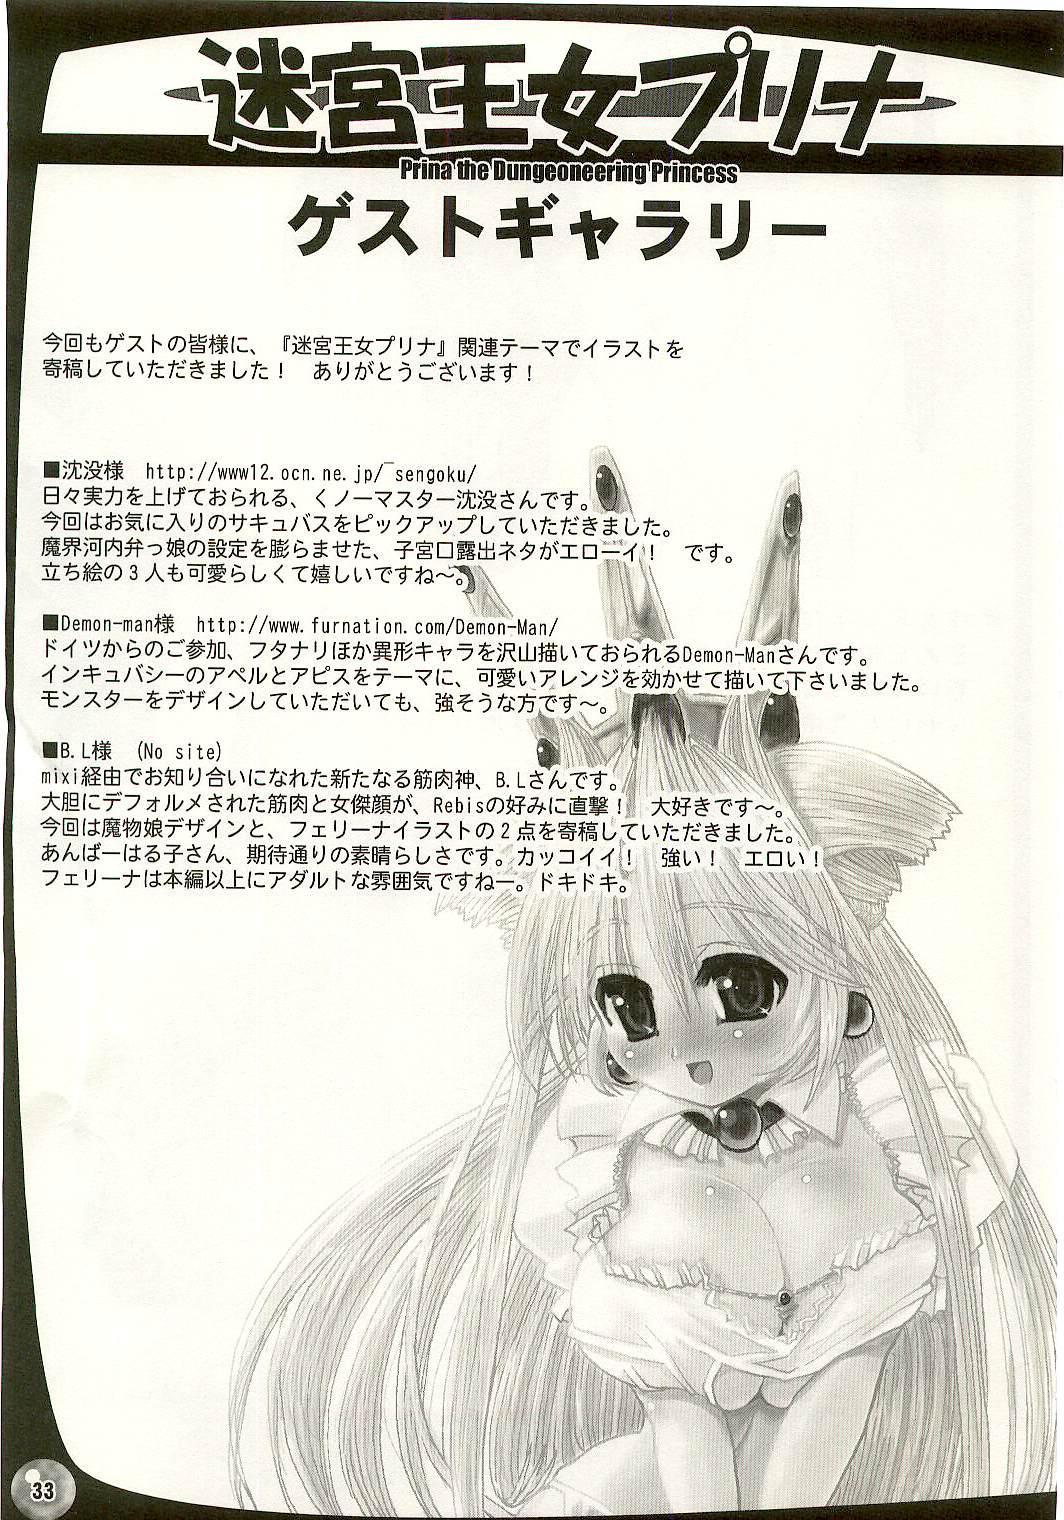 TGWOA Vol.17 - Meikyuu Oujo Prina 3 29